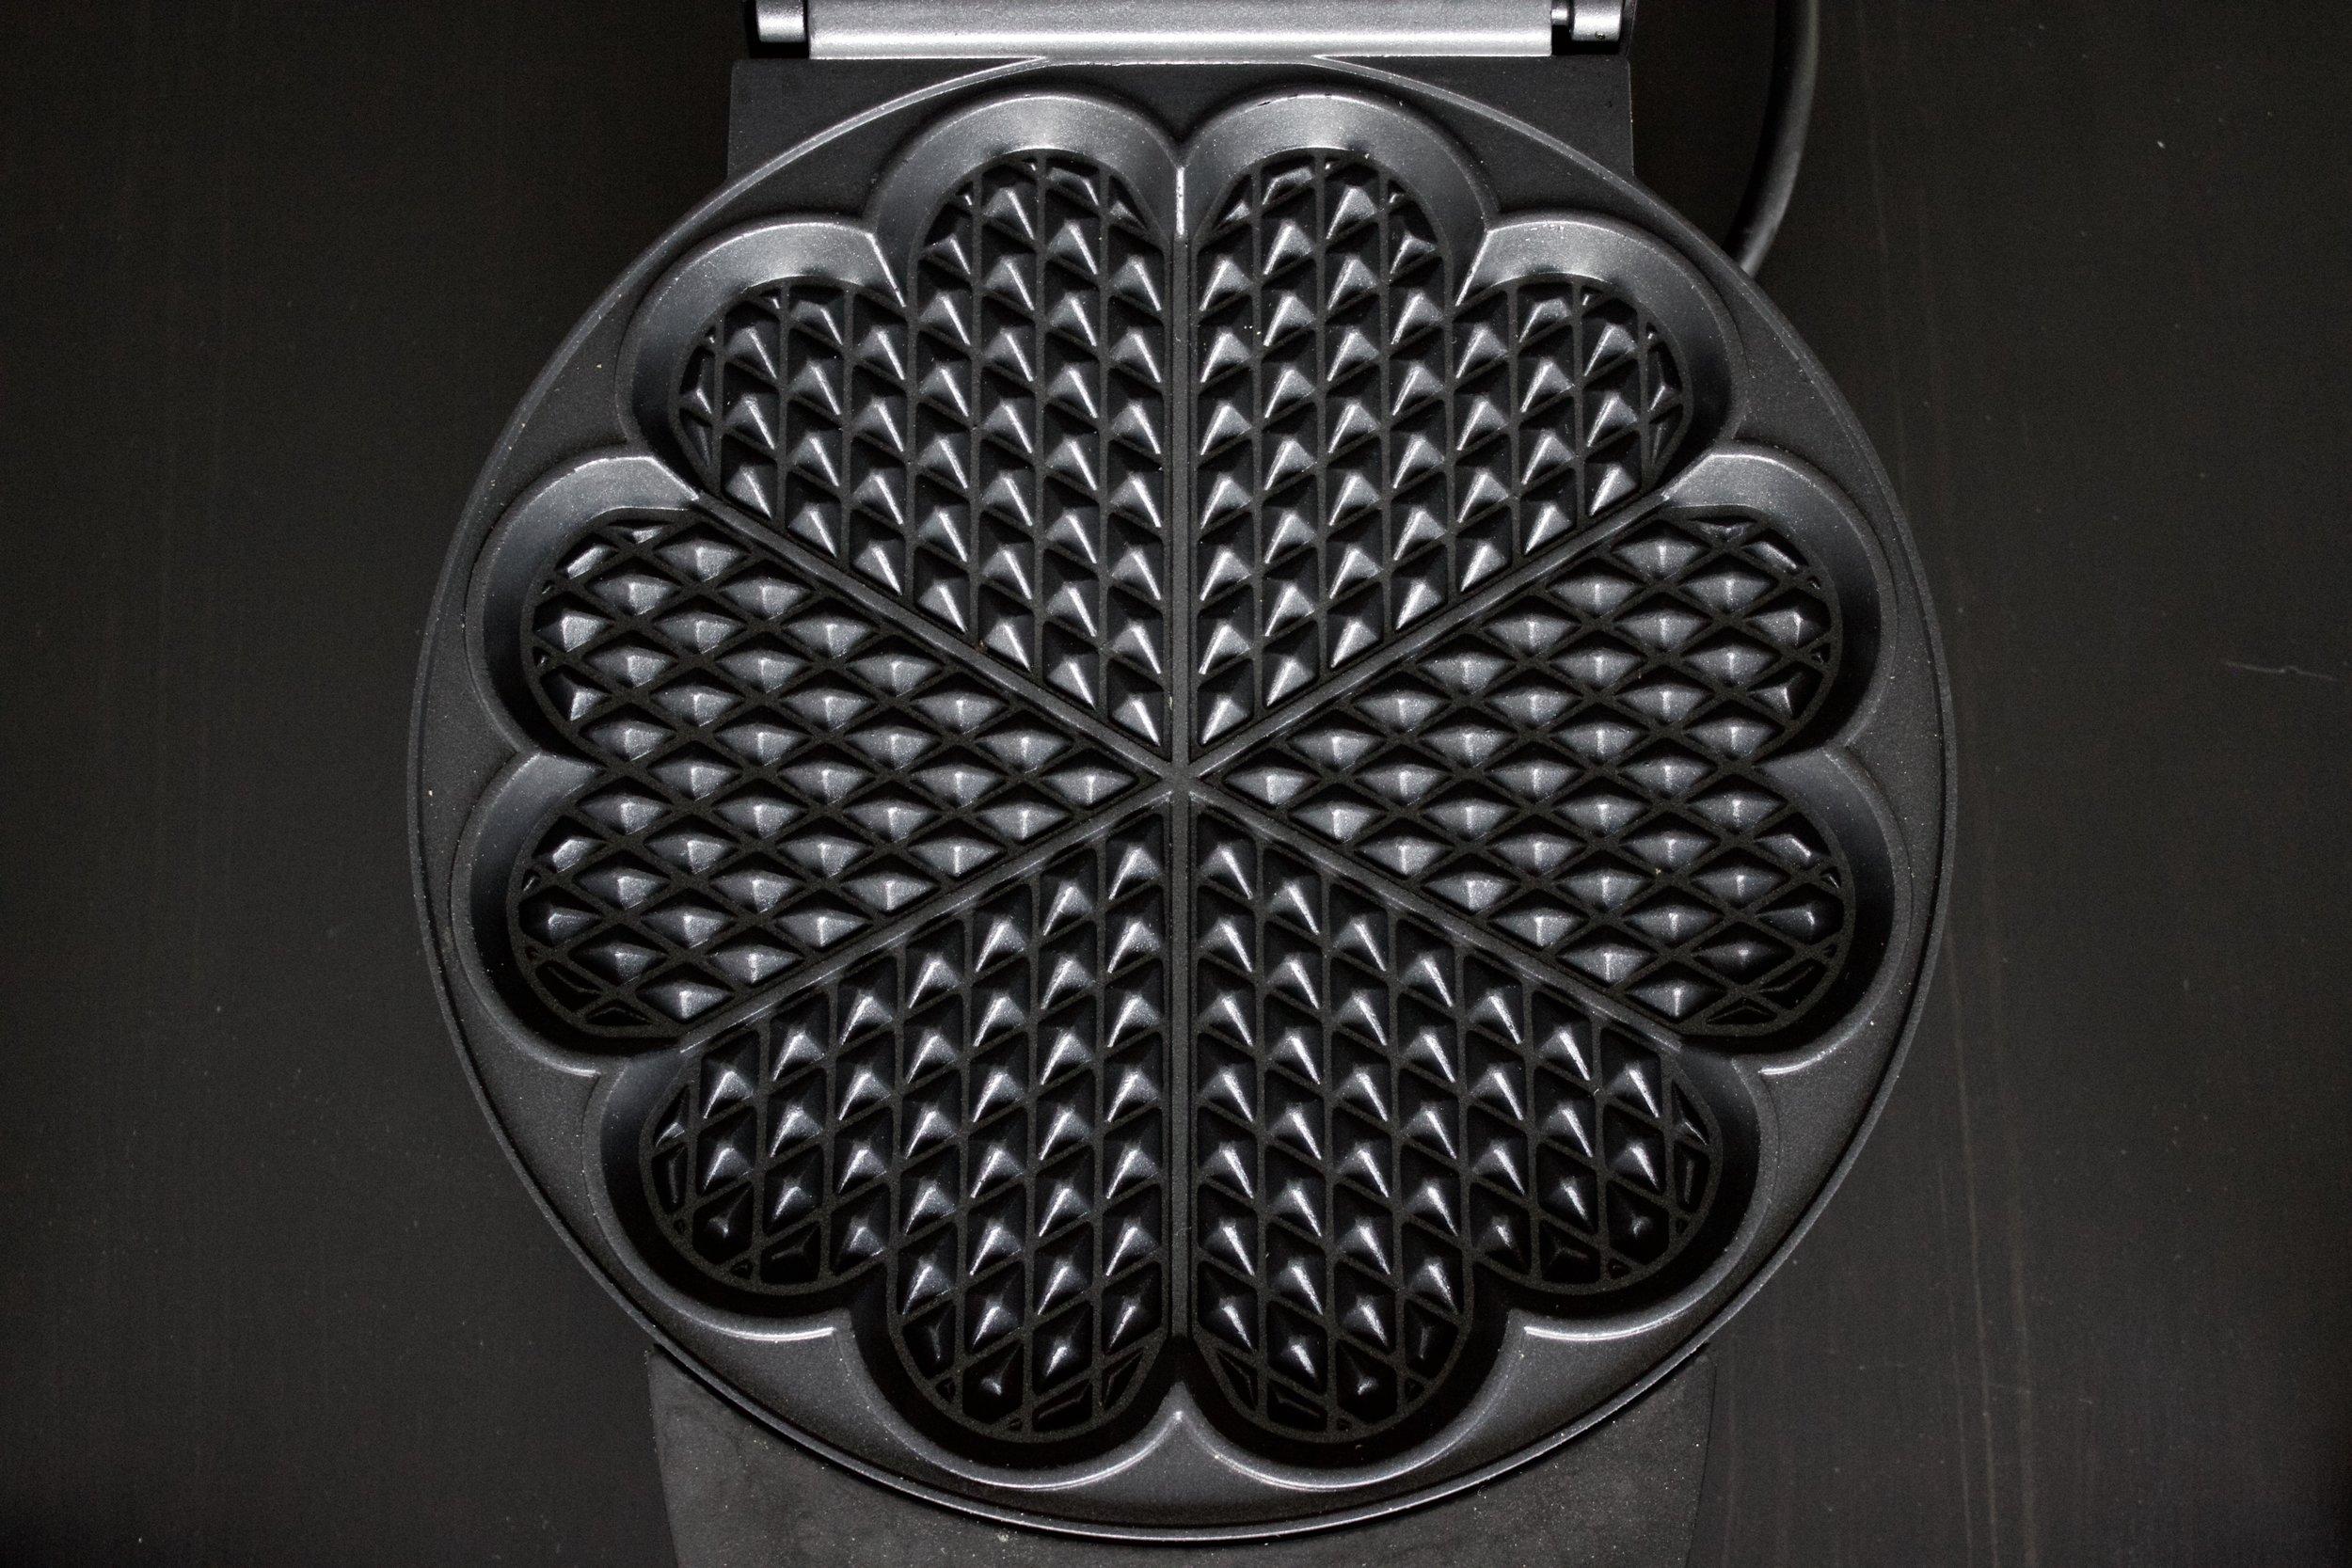 Scandinavian Heart-Shaped Waffles - my heart-shaped waffle iron | In Carina's Kitchen